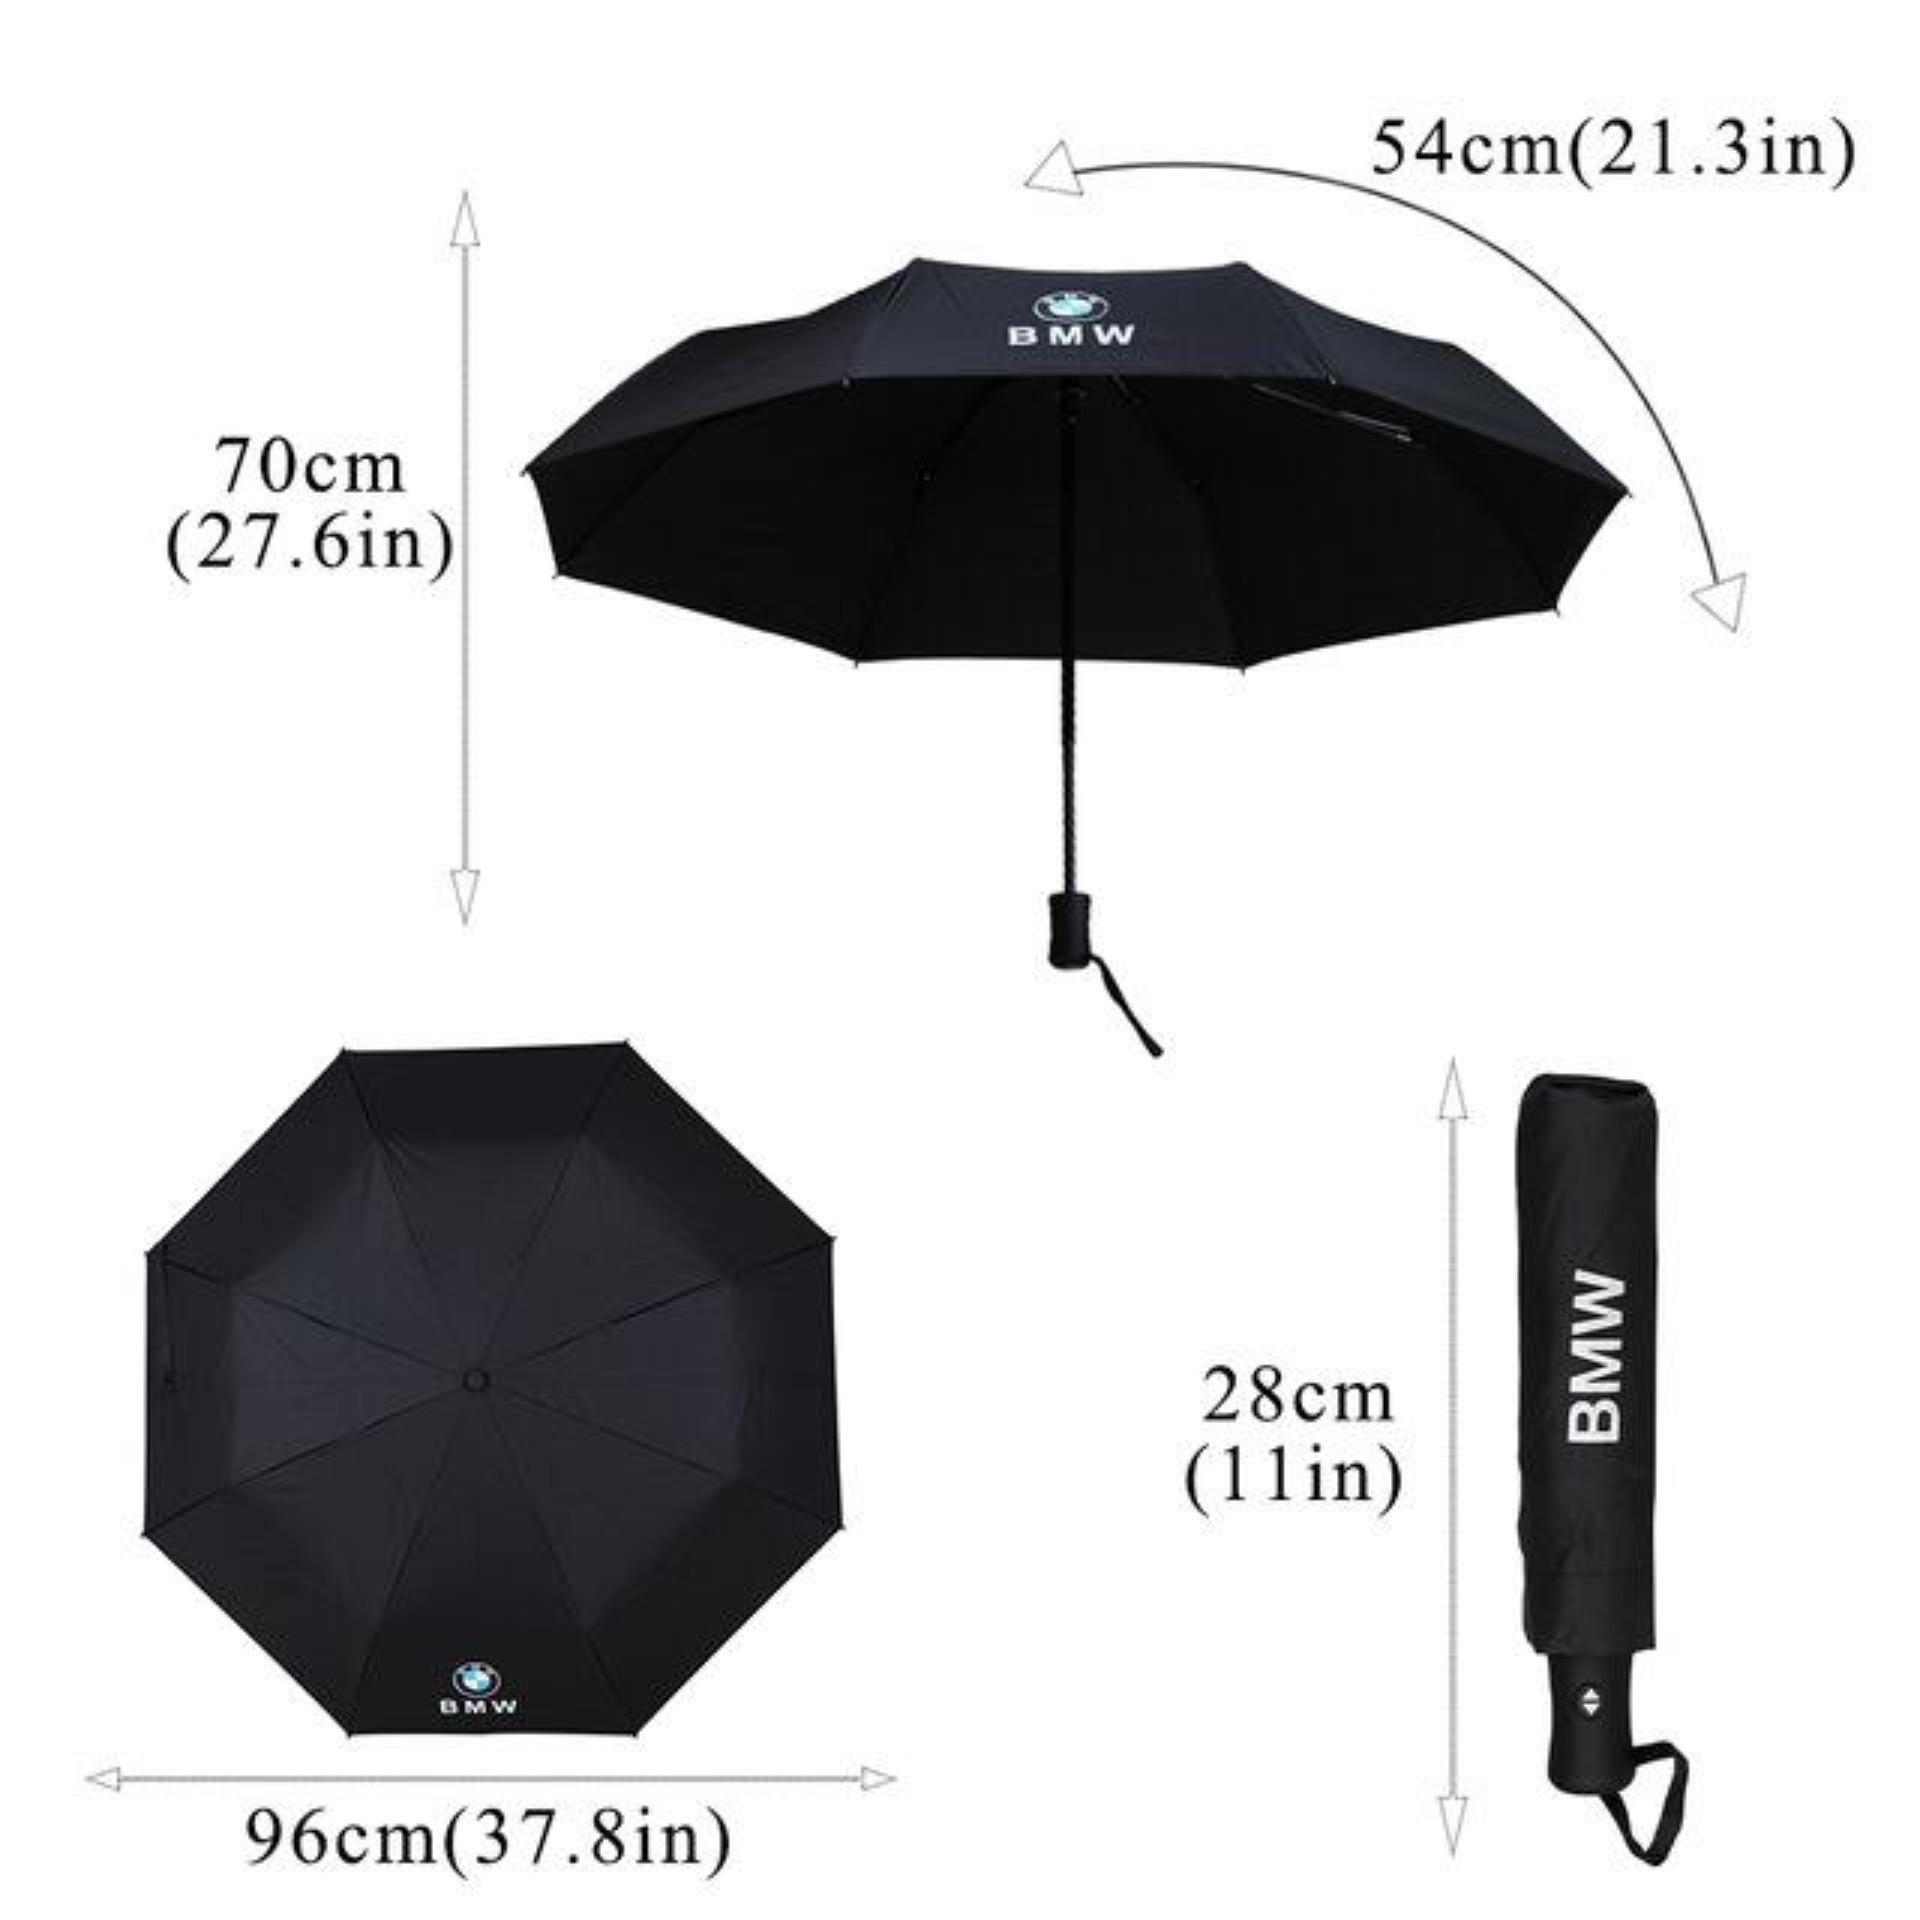 Price Checker Payung Lipat Otomatis Umbrella Automatic Folding Paayungg Hitam Besarr